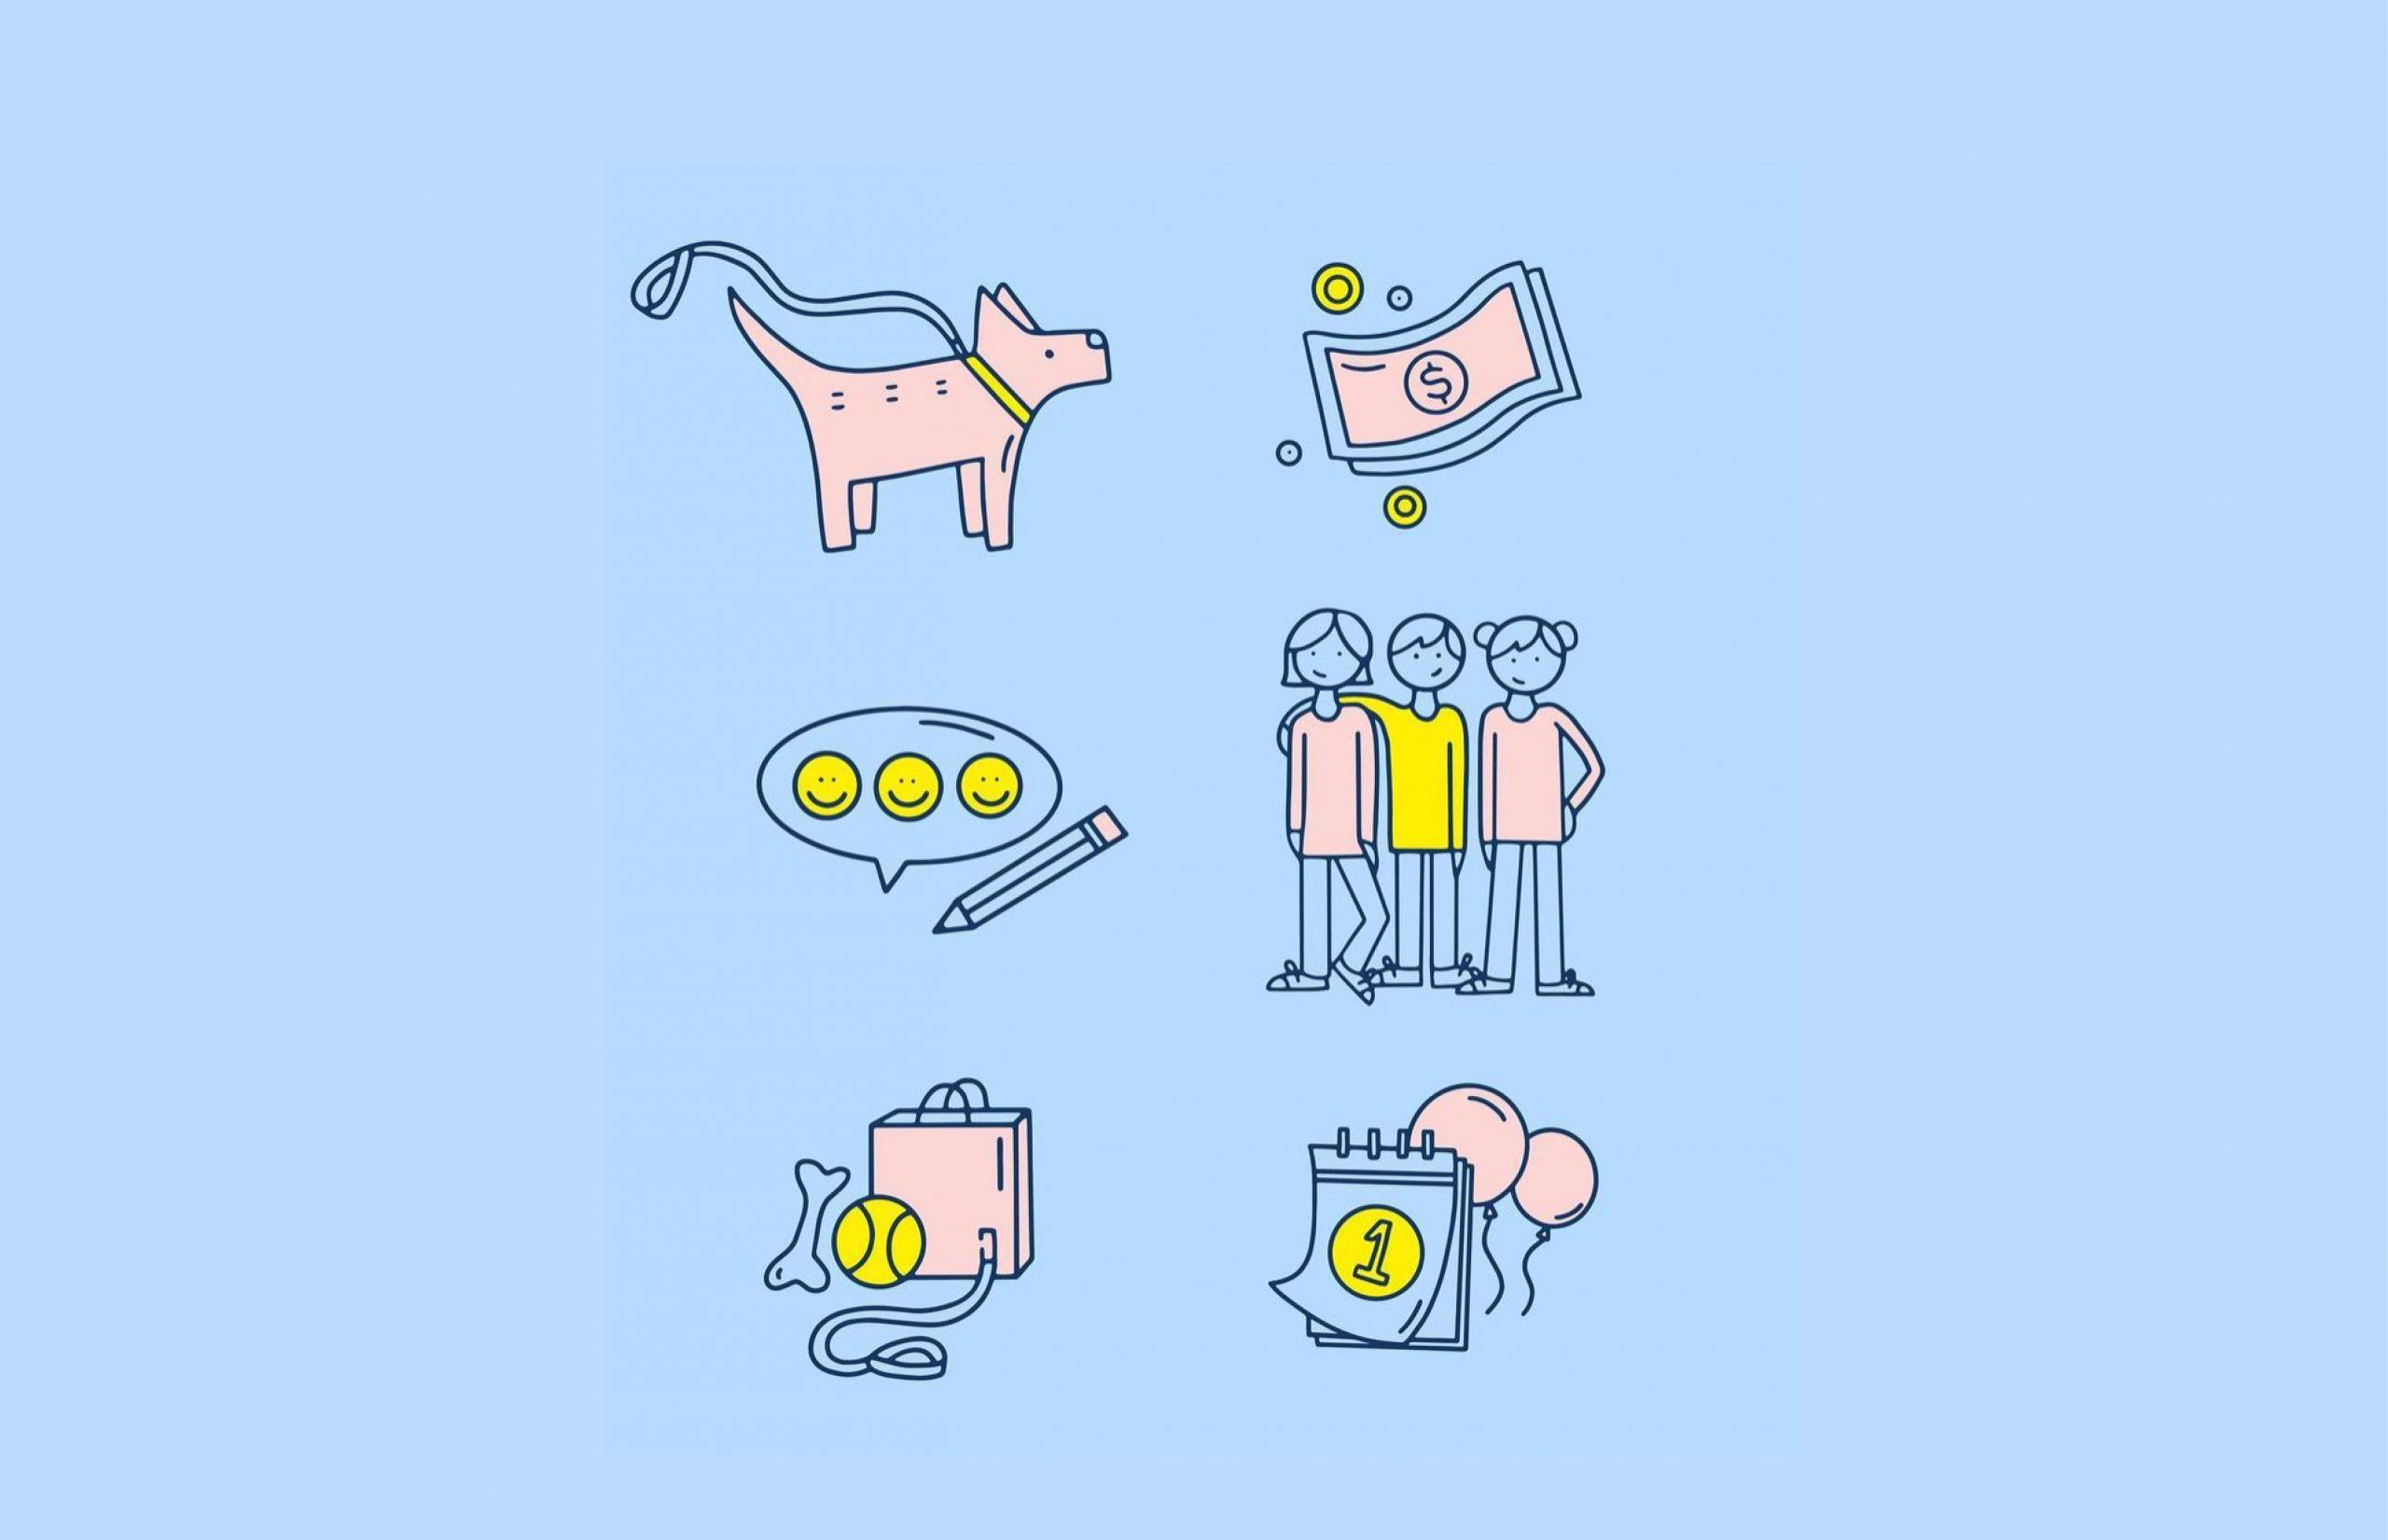 dog icon, money icon, speech bubble icon, friends icon, dog toys icon, calendar icon